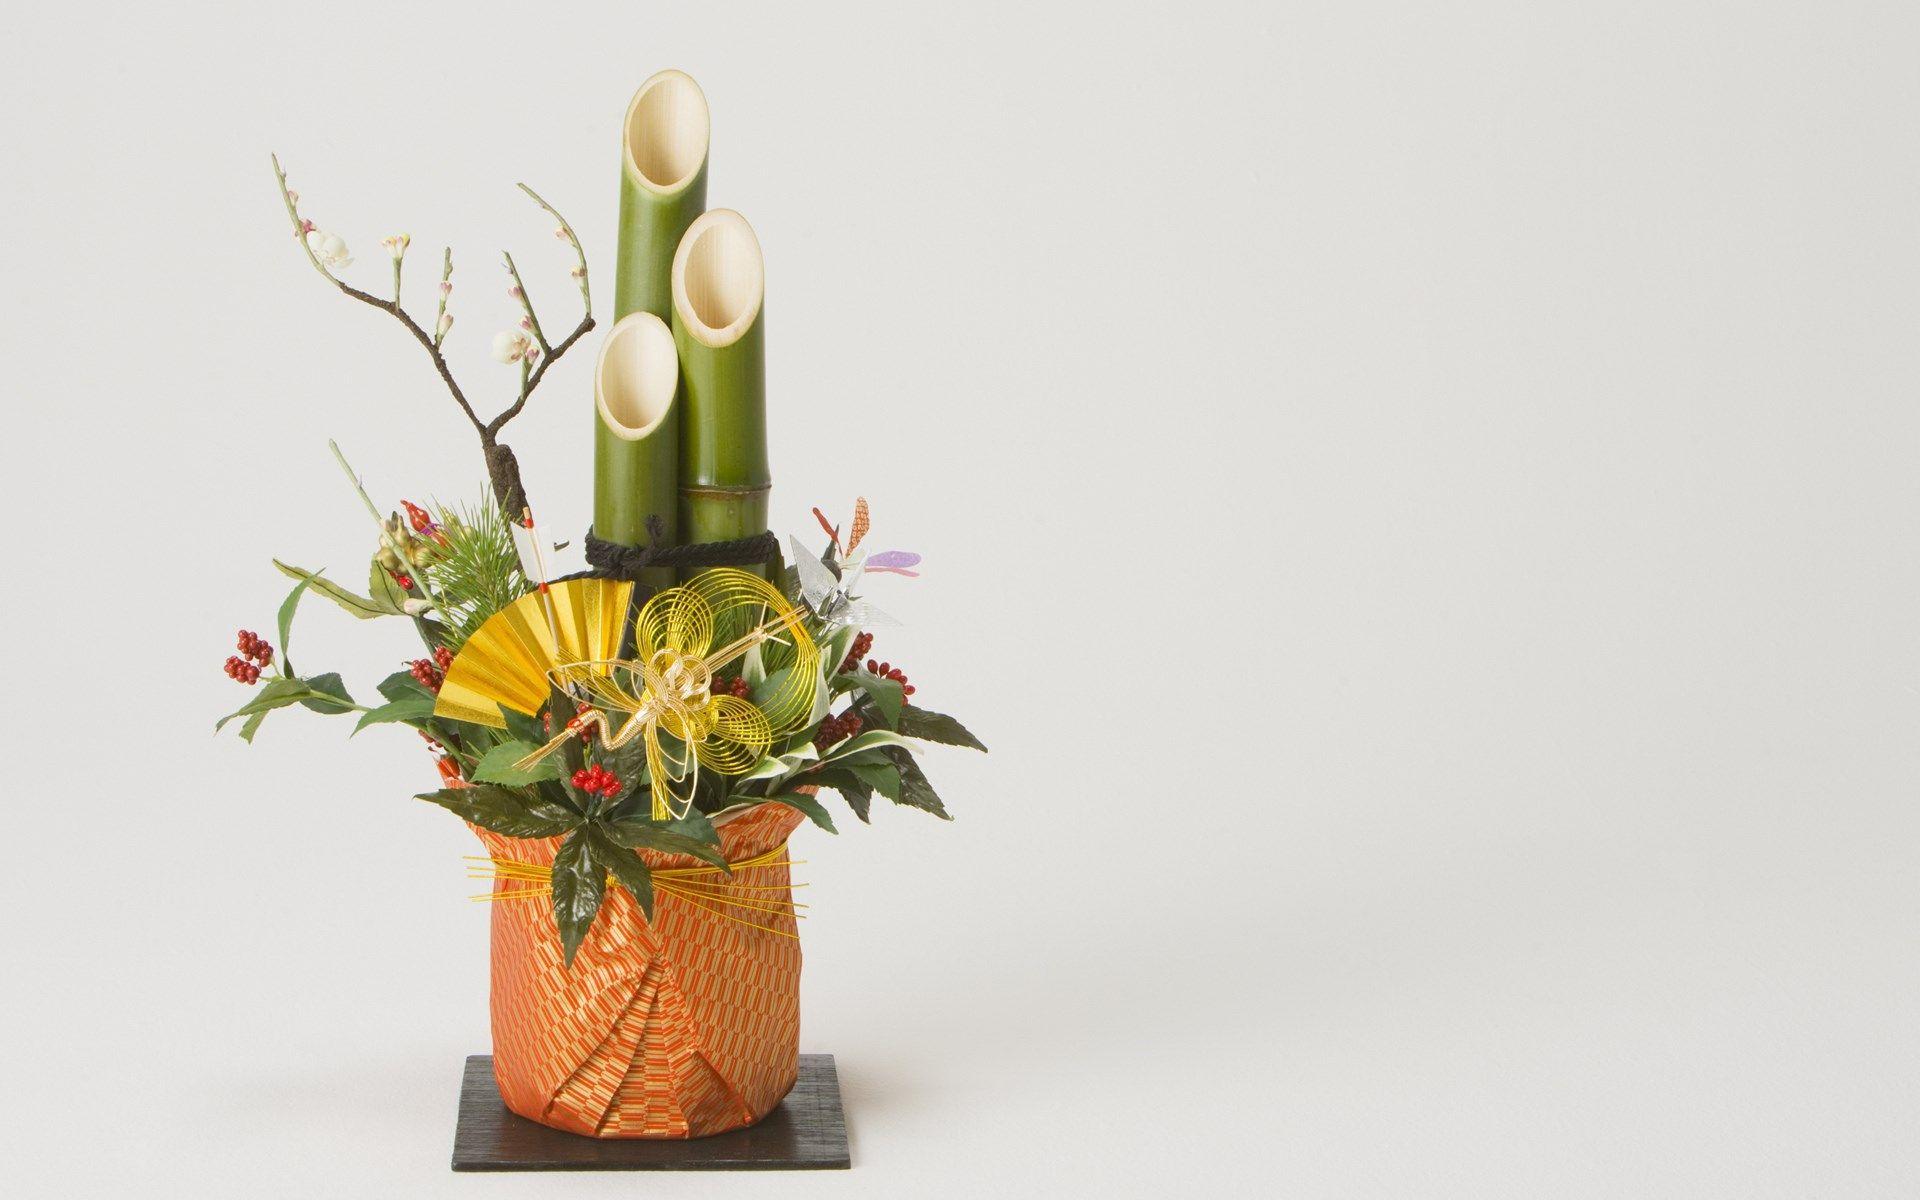 1920x1200 Quality Cool still life Ikebana, Azalea flower